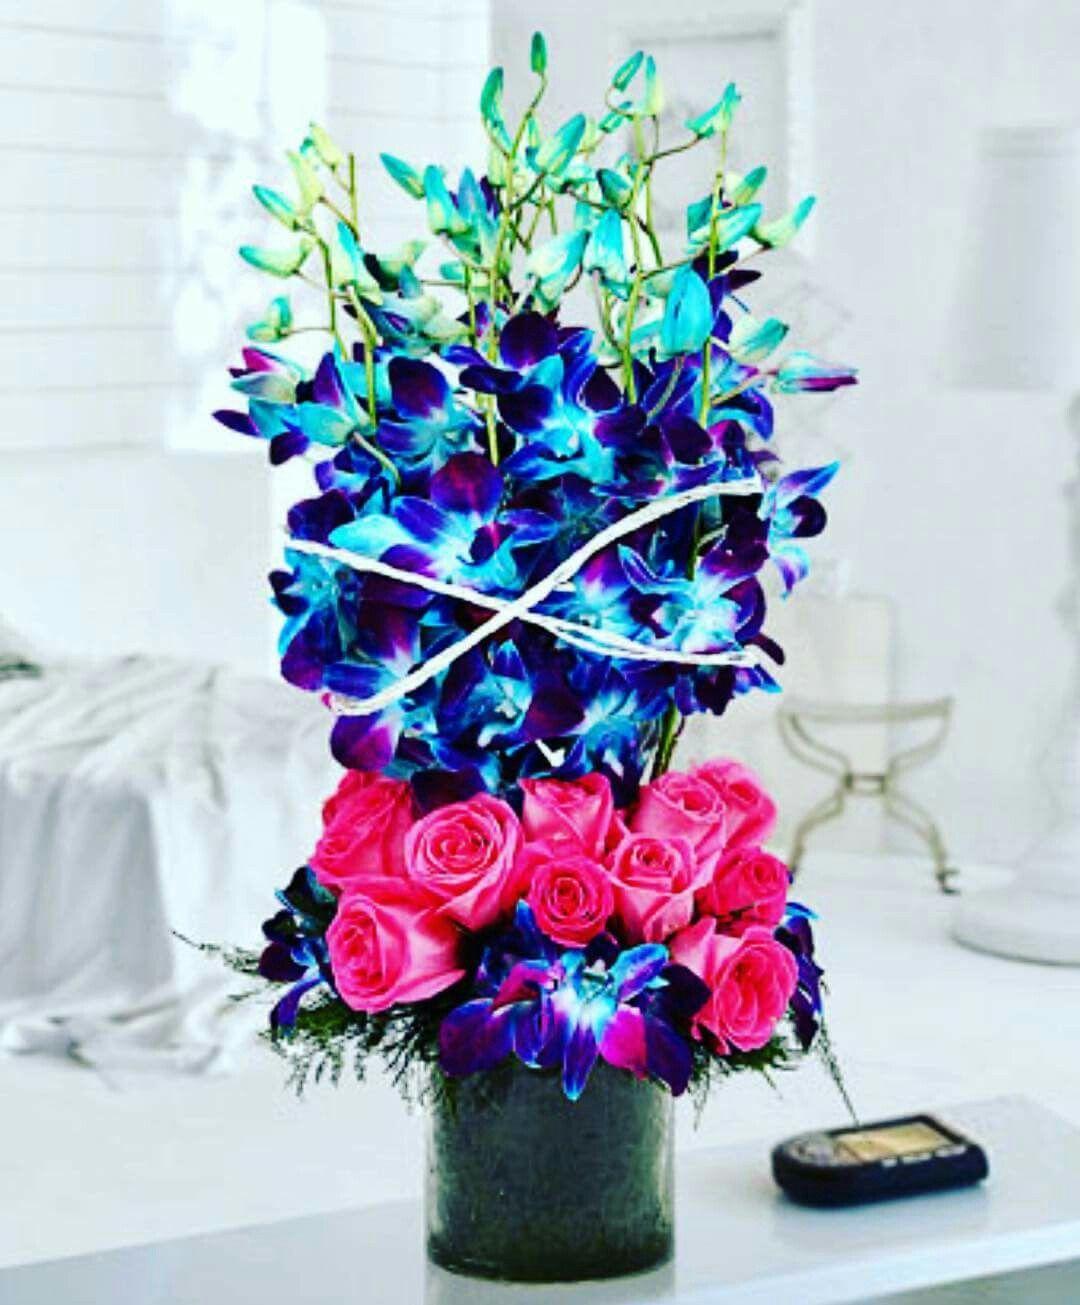 Pin By Shruti Gupta On Arrangements Pinterest Flowers Vase And